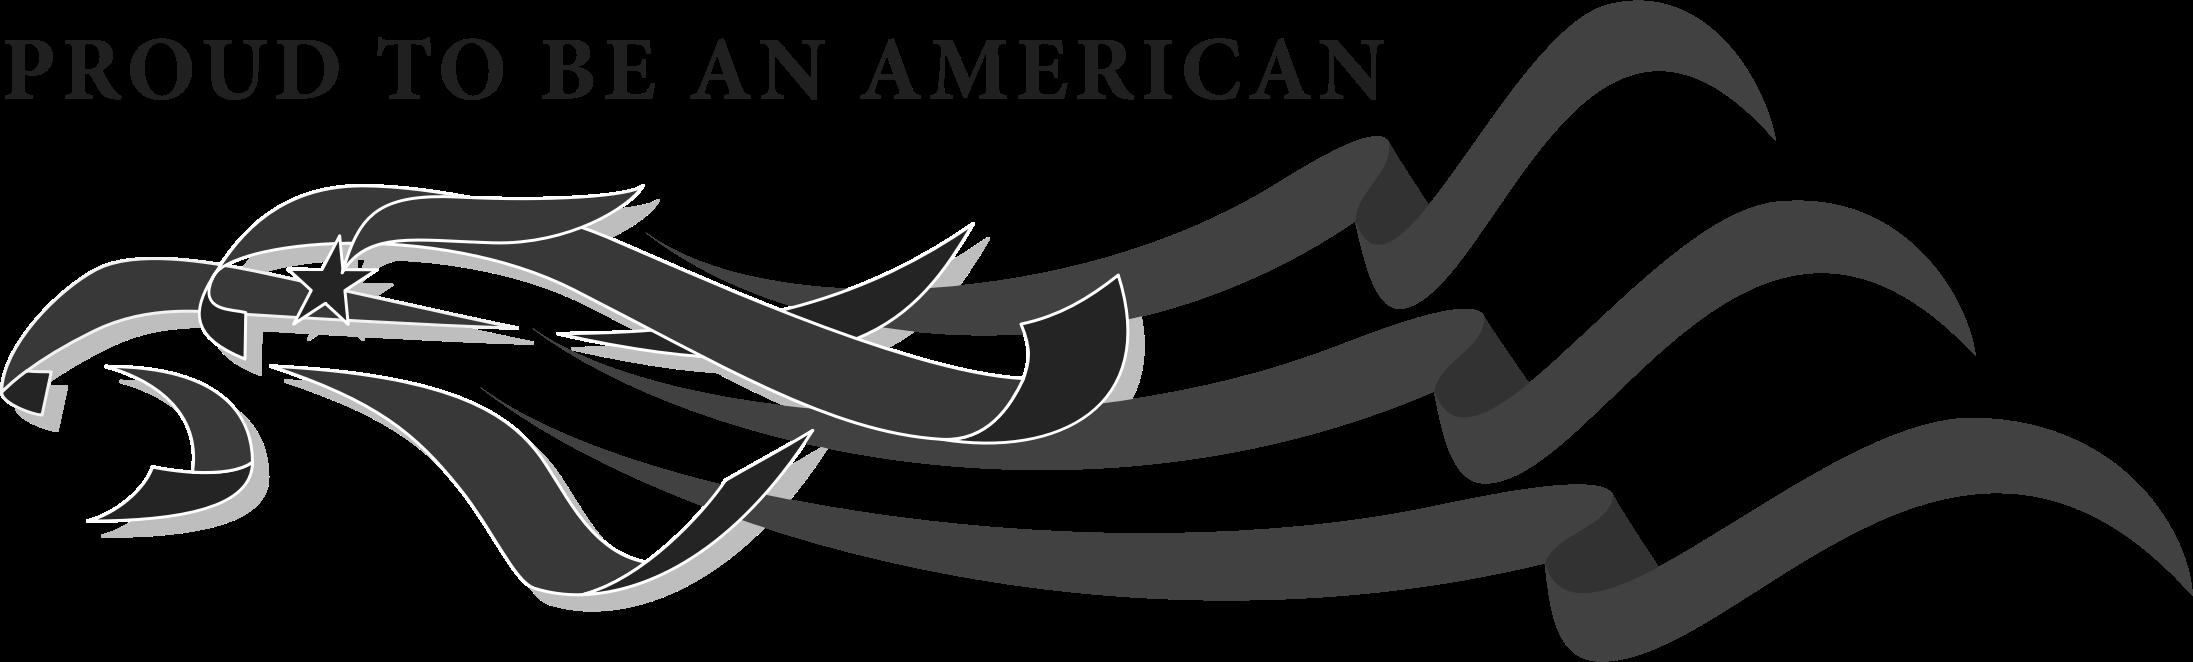 American eagle clipartblack com. Proud clipart black and white